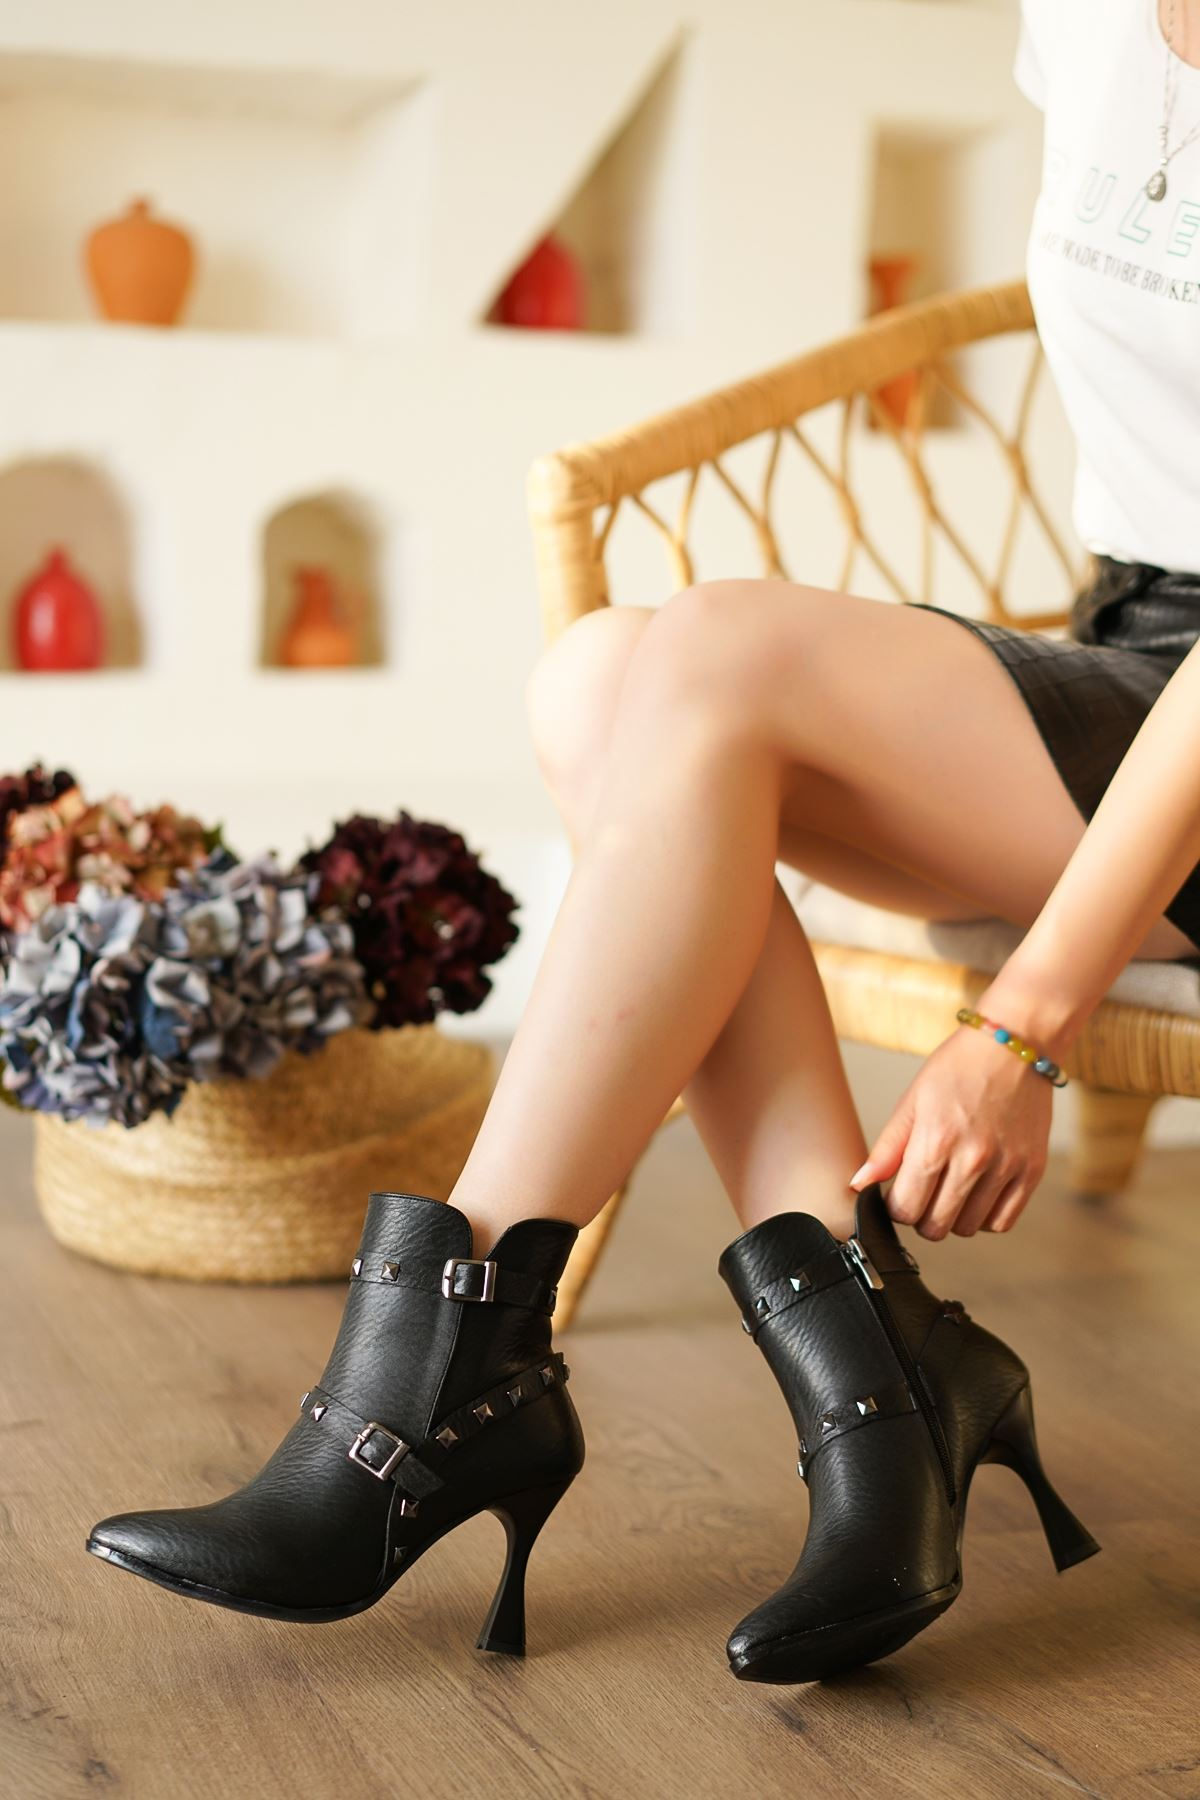 Nİde Siyah Mat Deri Yüksek Topuklu Kadın Bot